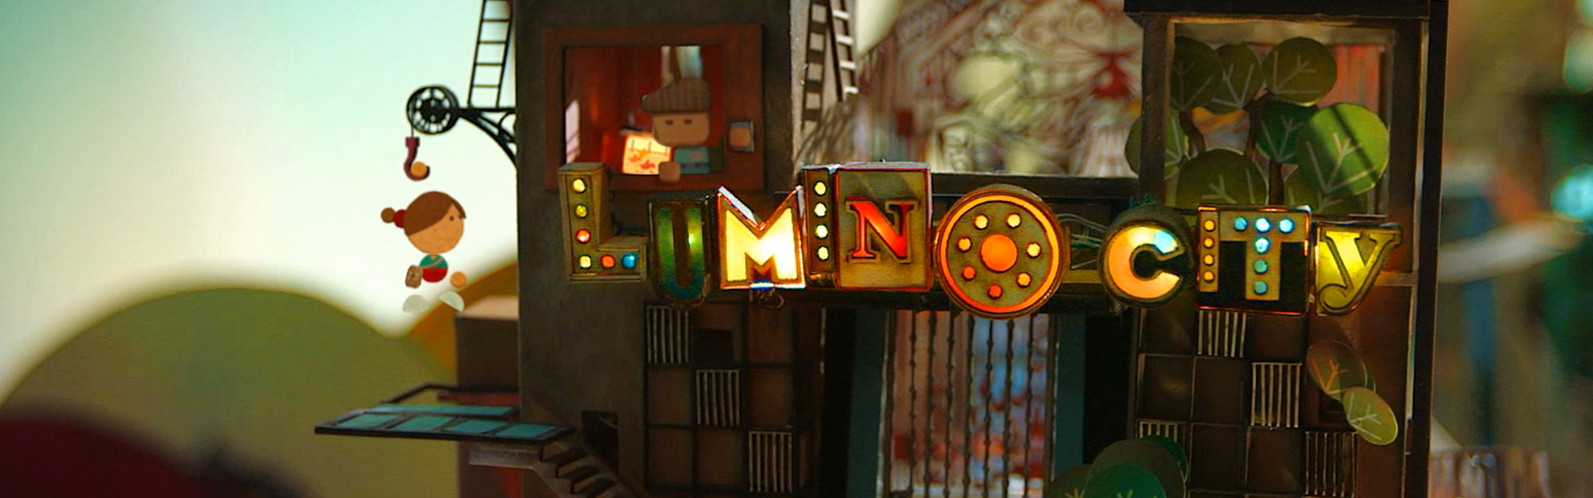 Lumino City, Go Beyond The City Walls